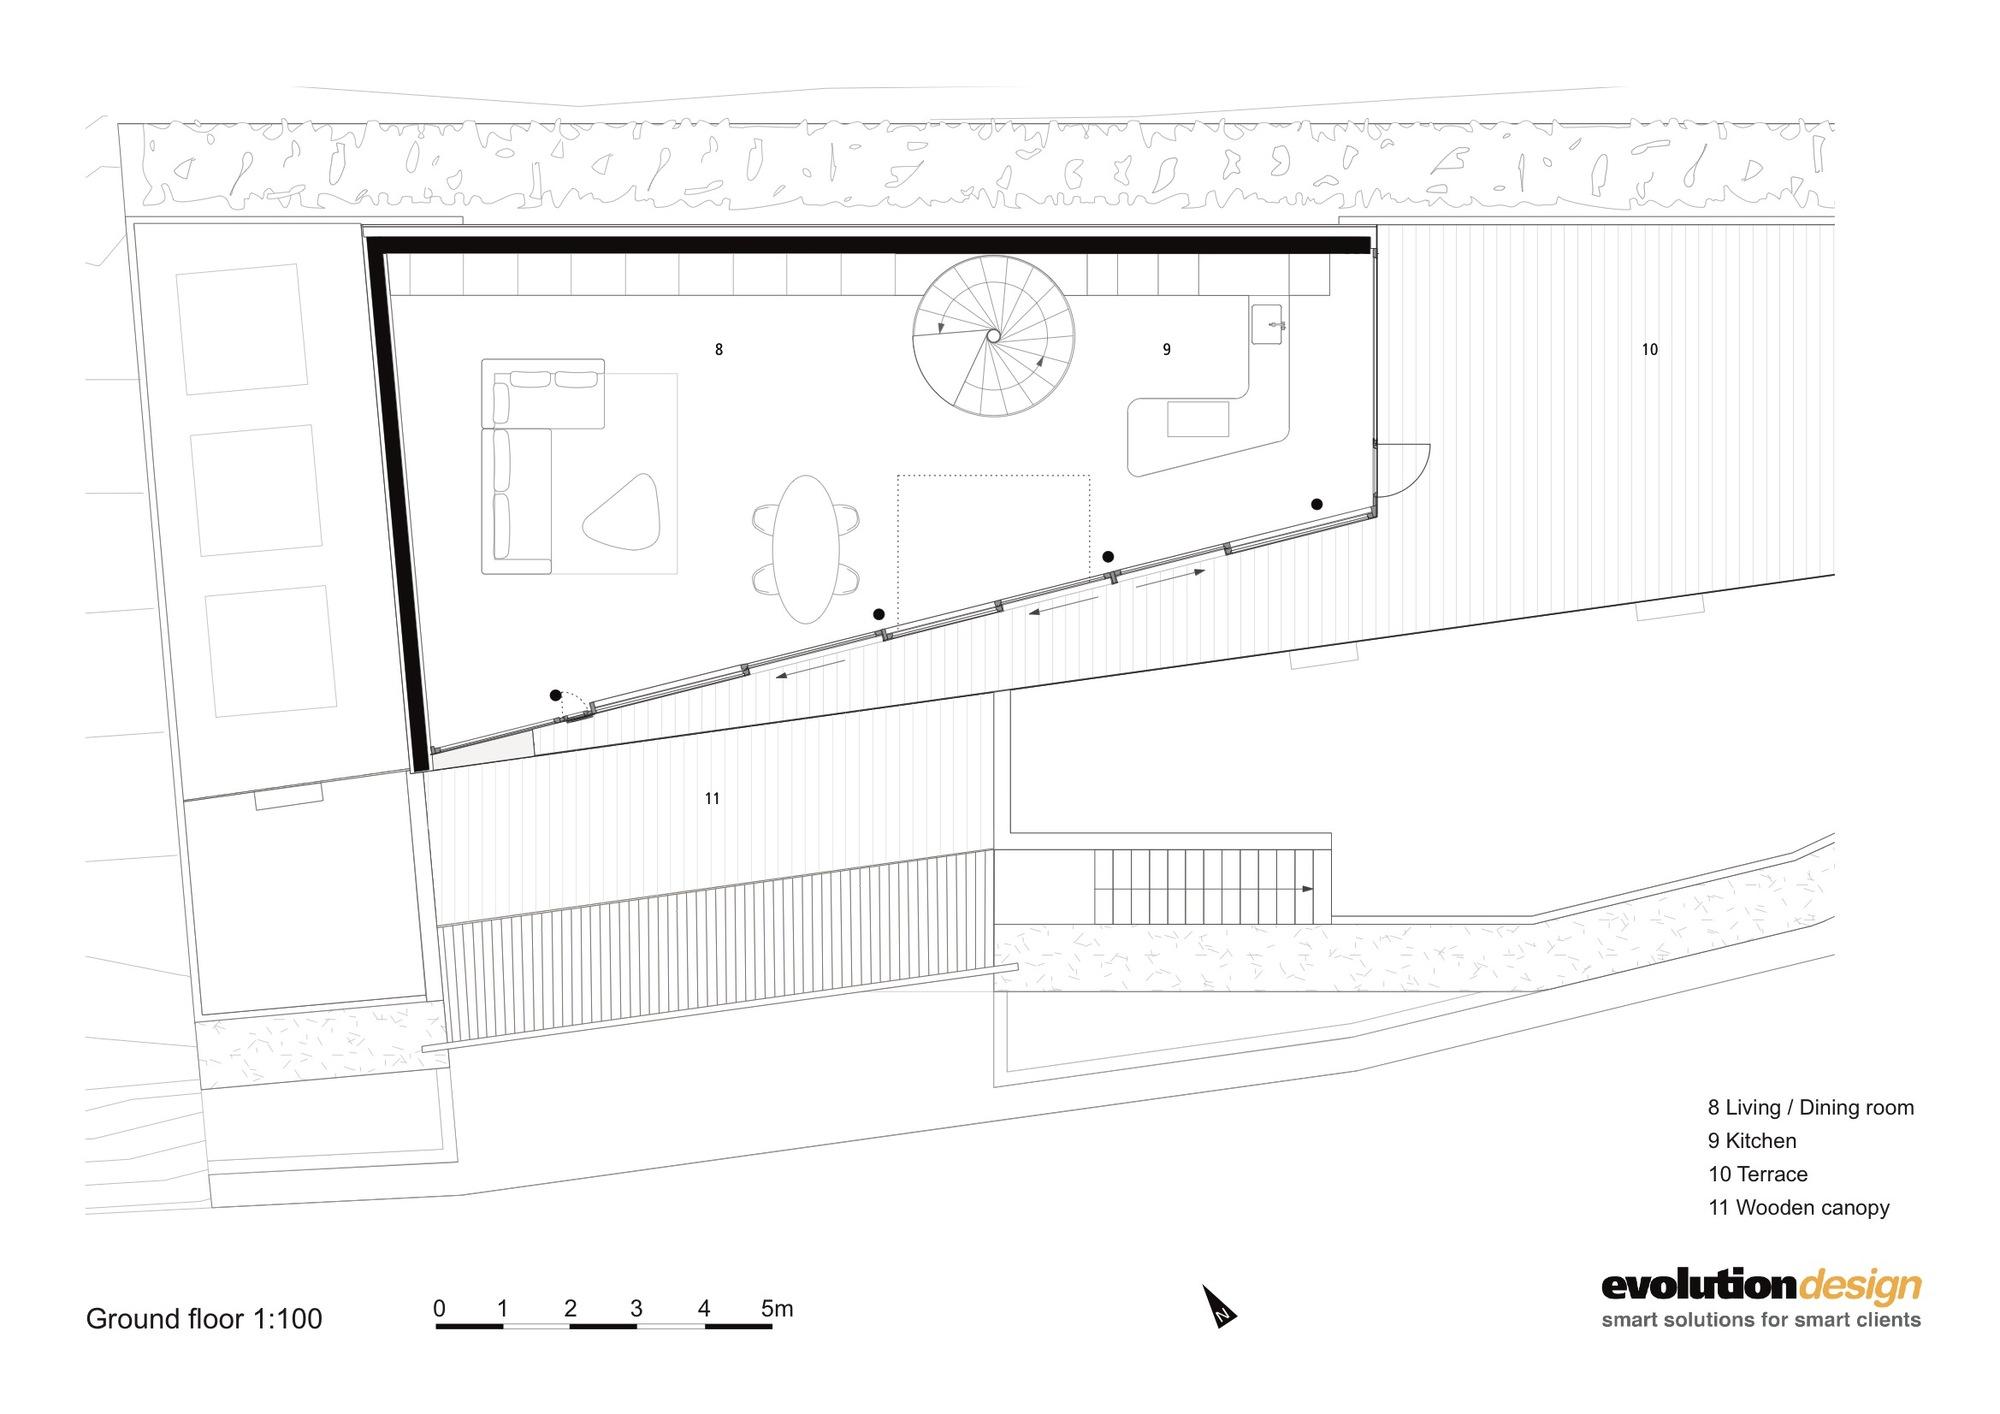 2000x1414 Gallery Of Flexhouse Evolution Design